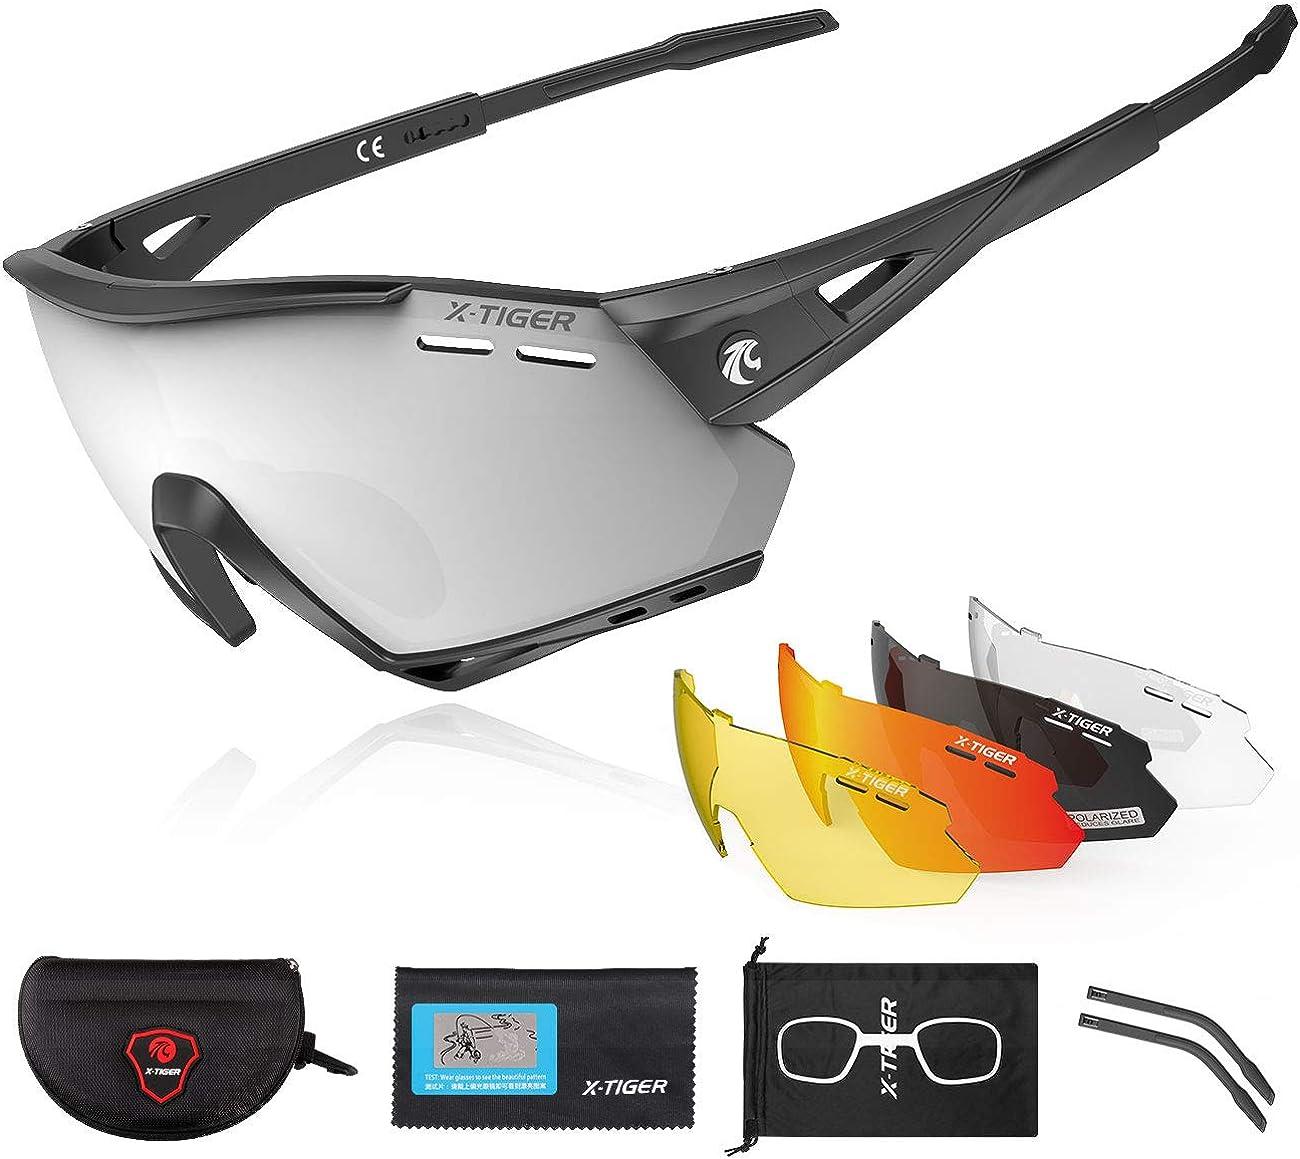 X-TIGER Polarized Sports Cycling Biking New arrival Interc Japan Maker New with 5 Sunglasses